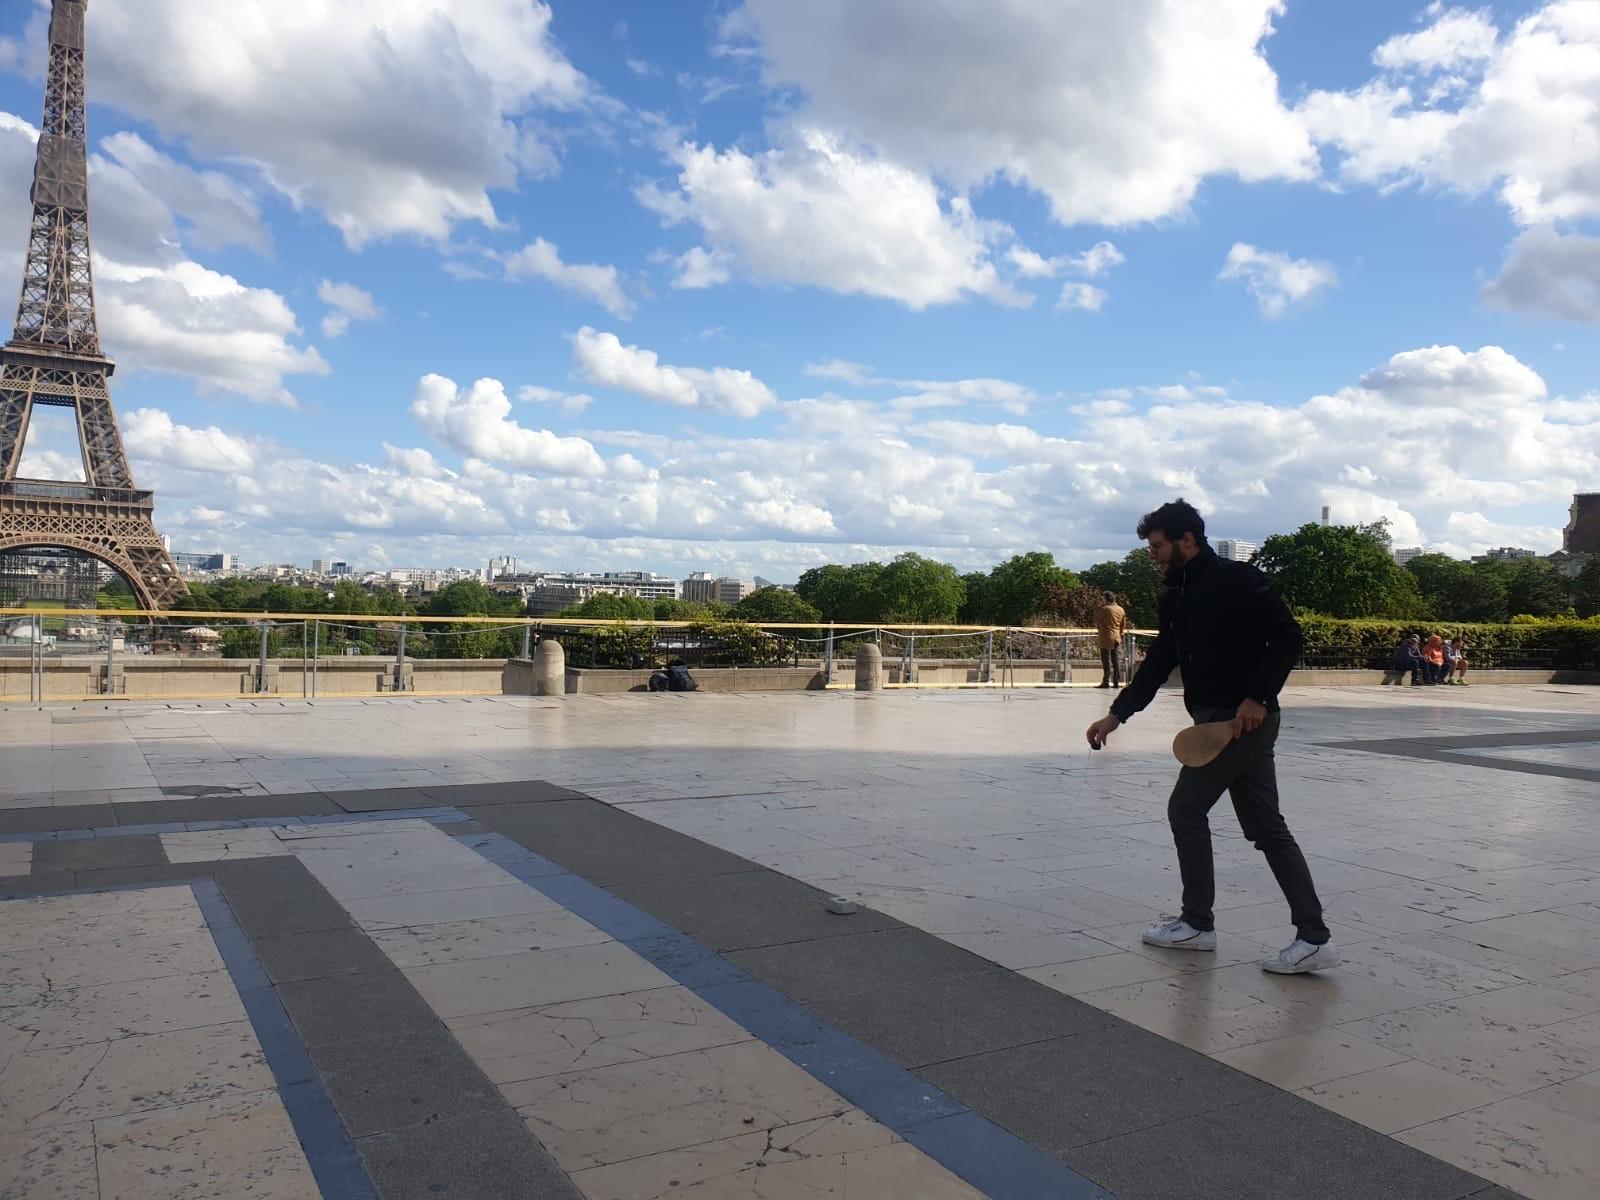 Jokari session, Avril 2020, Tour Eiffel